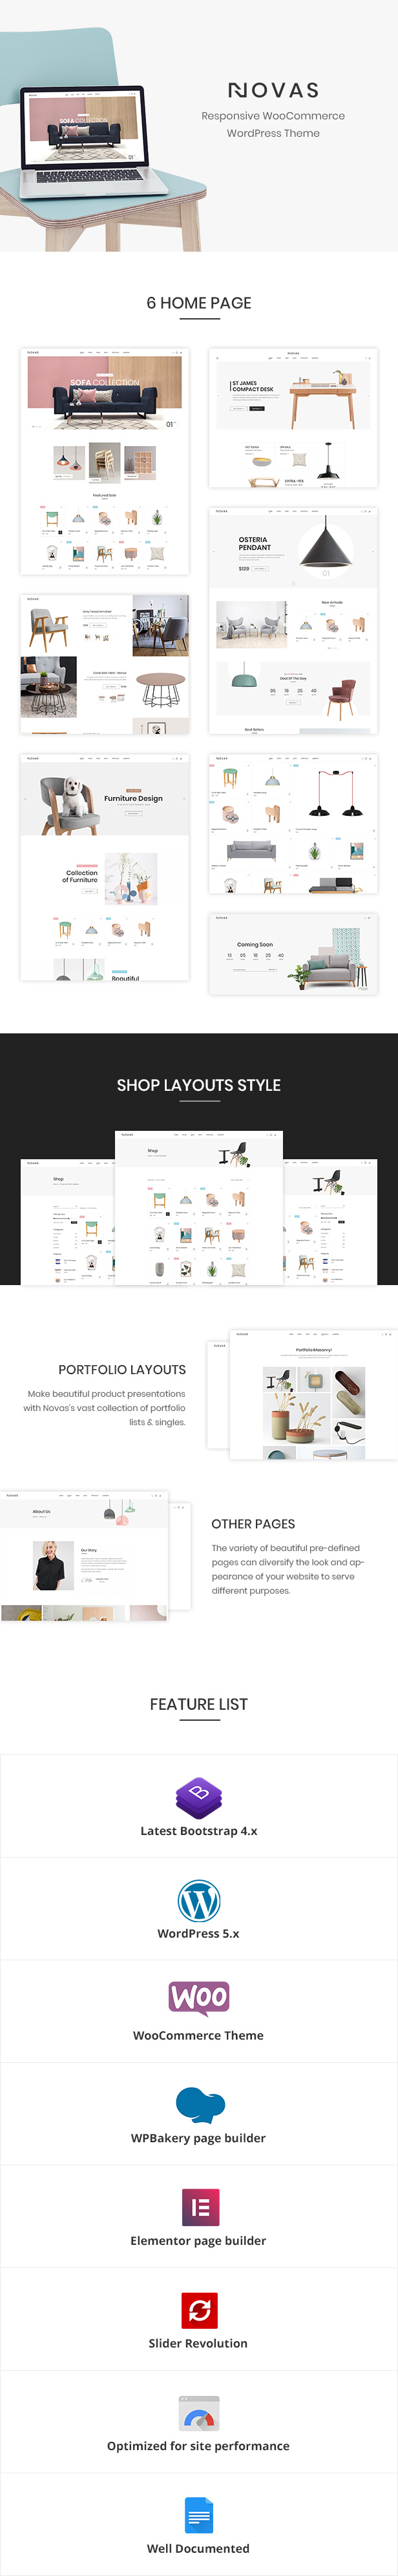 Novas | Furniture Store and Handmade Shop WordPress Theme - 1